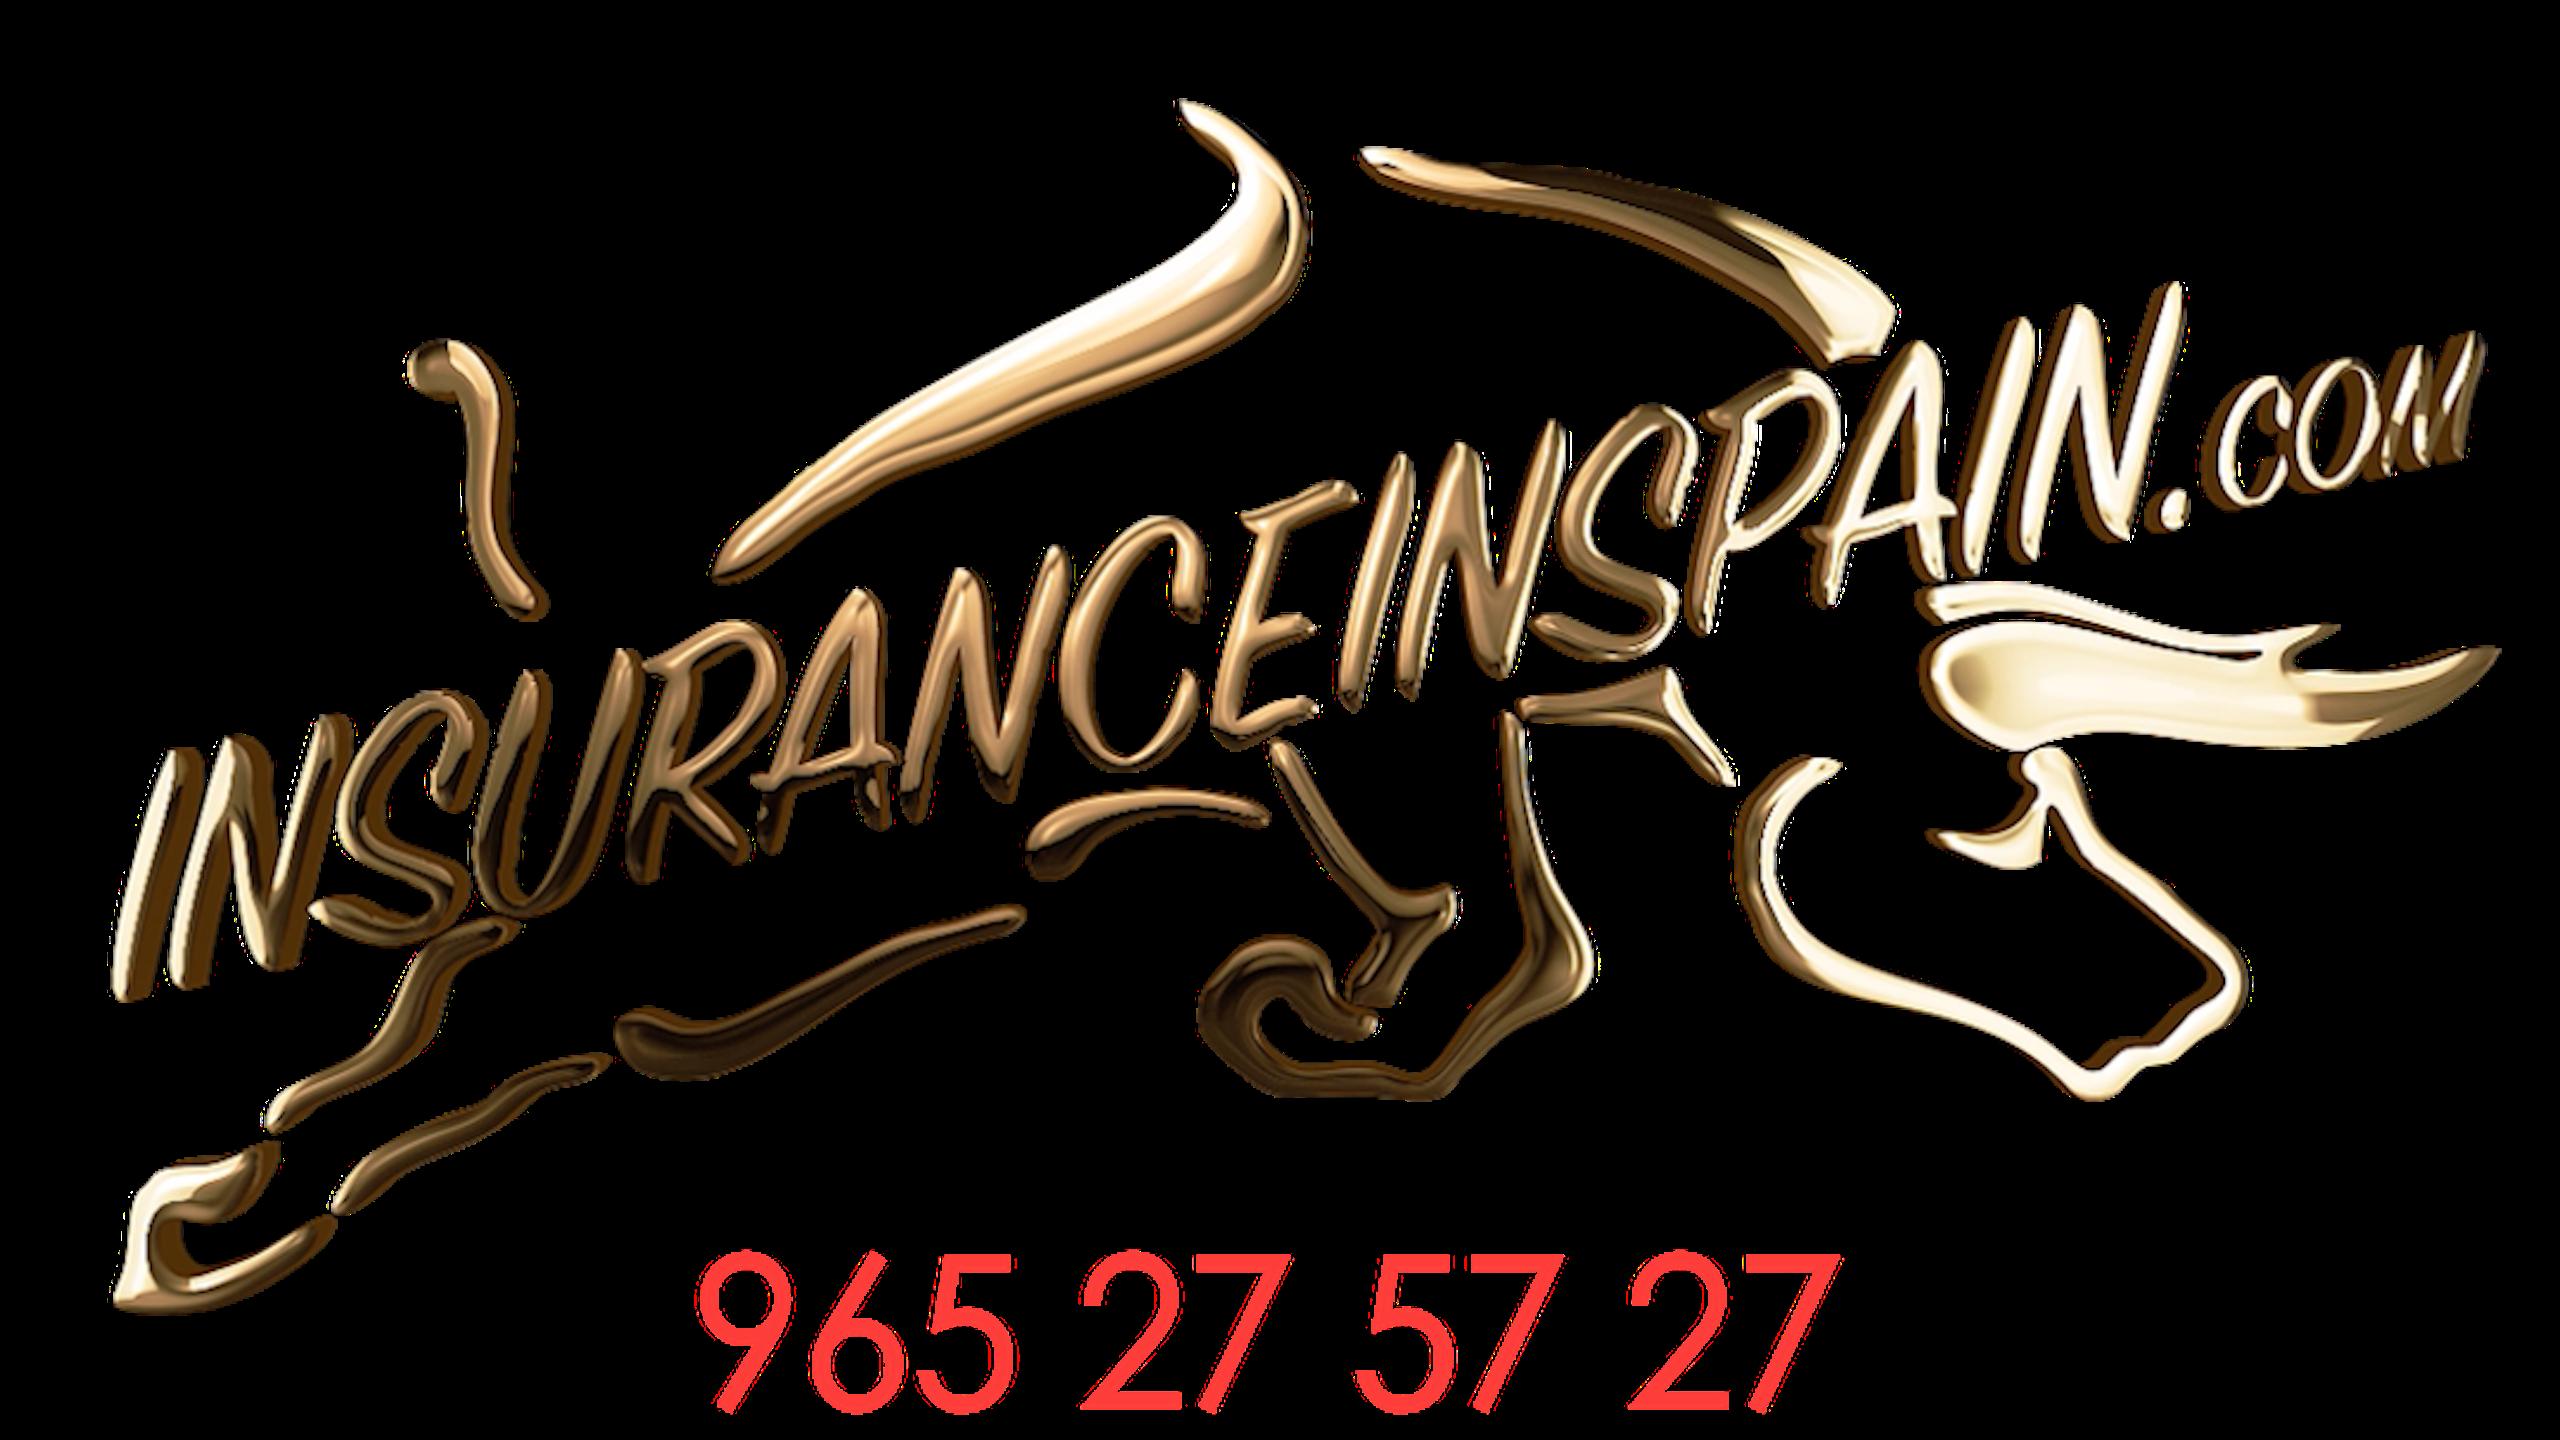 The cheapest travel insurance in Spain www.insuranceinspain.com